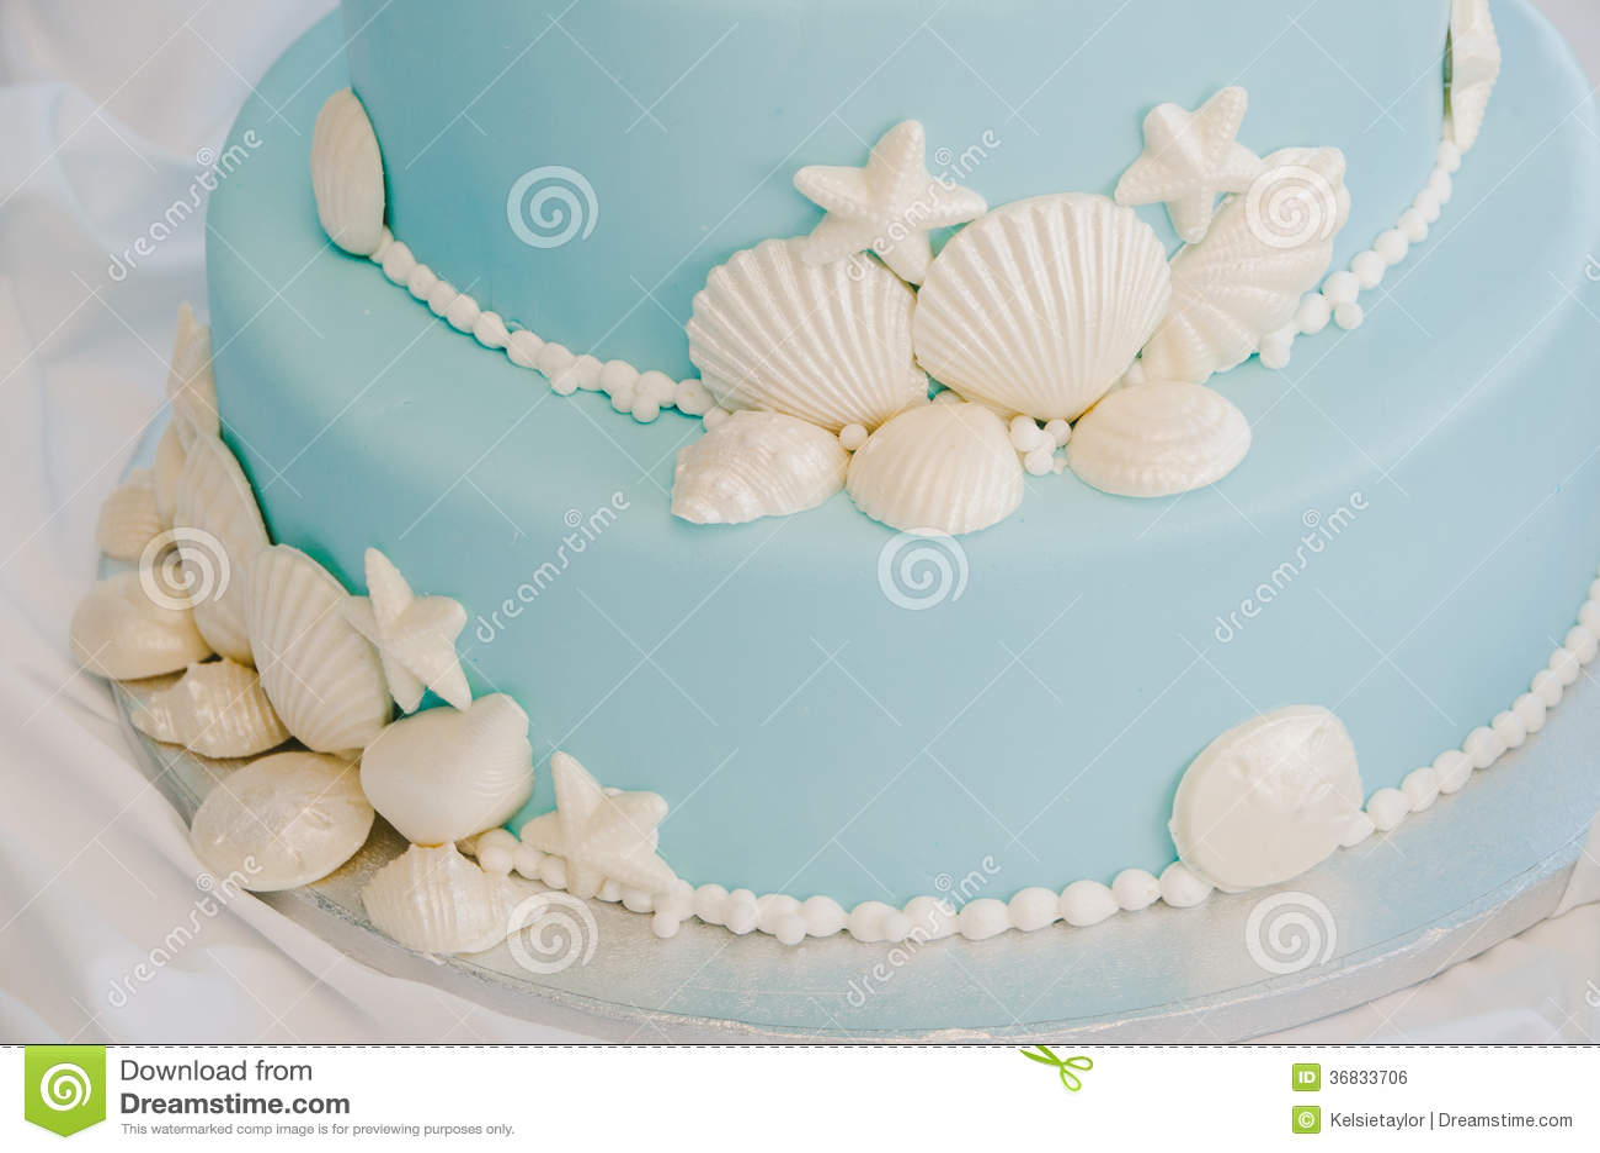 Edible Beach Cake Decorations